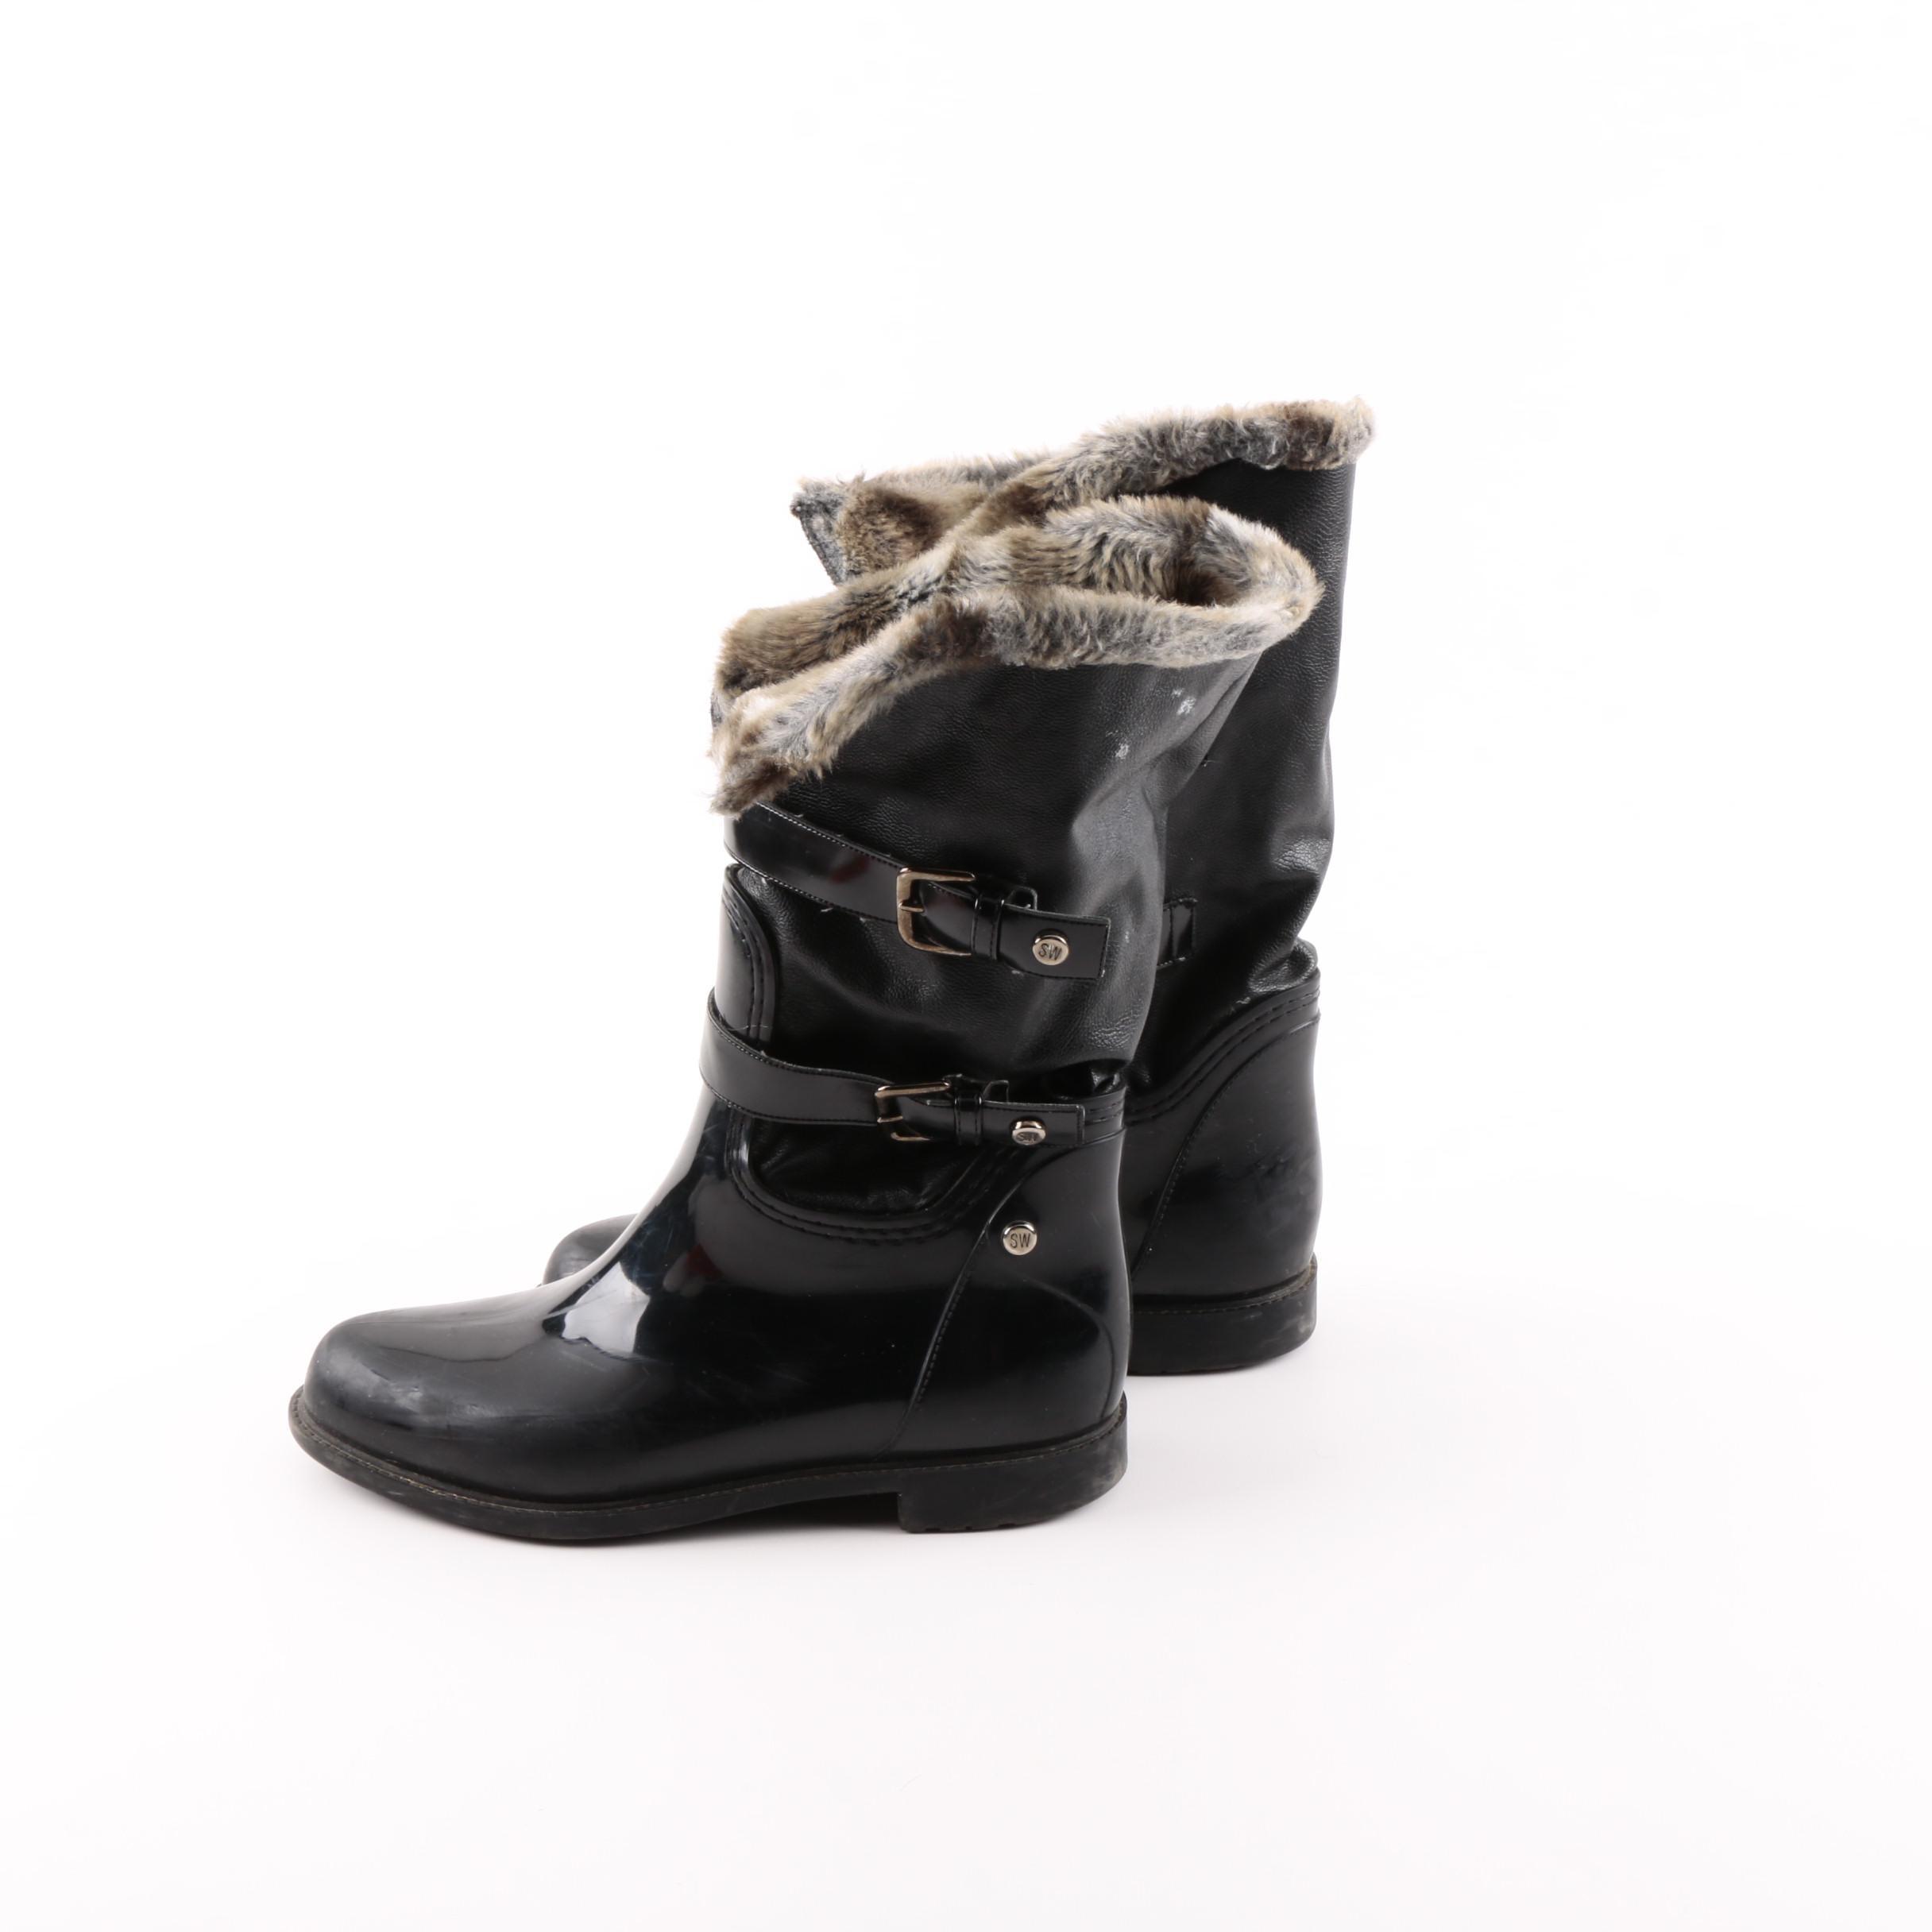 Stuart Weitzman Winter Boots